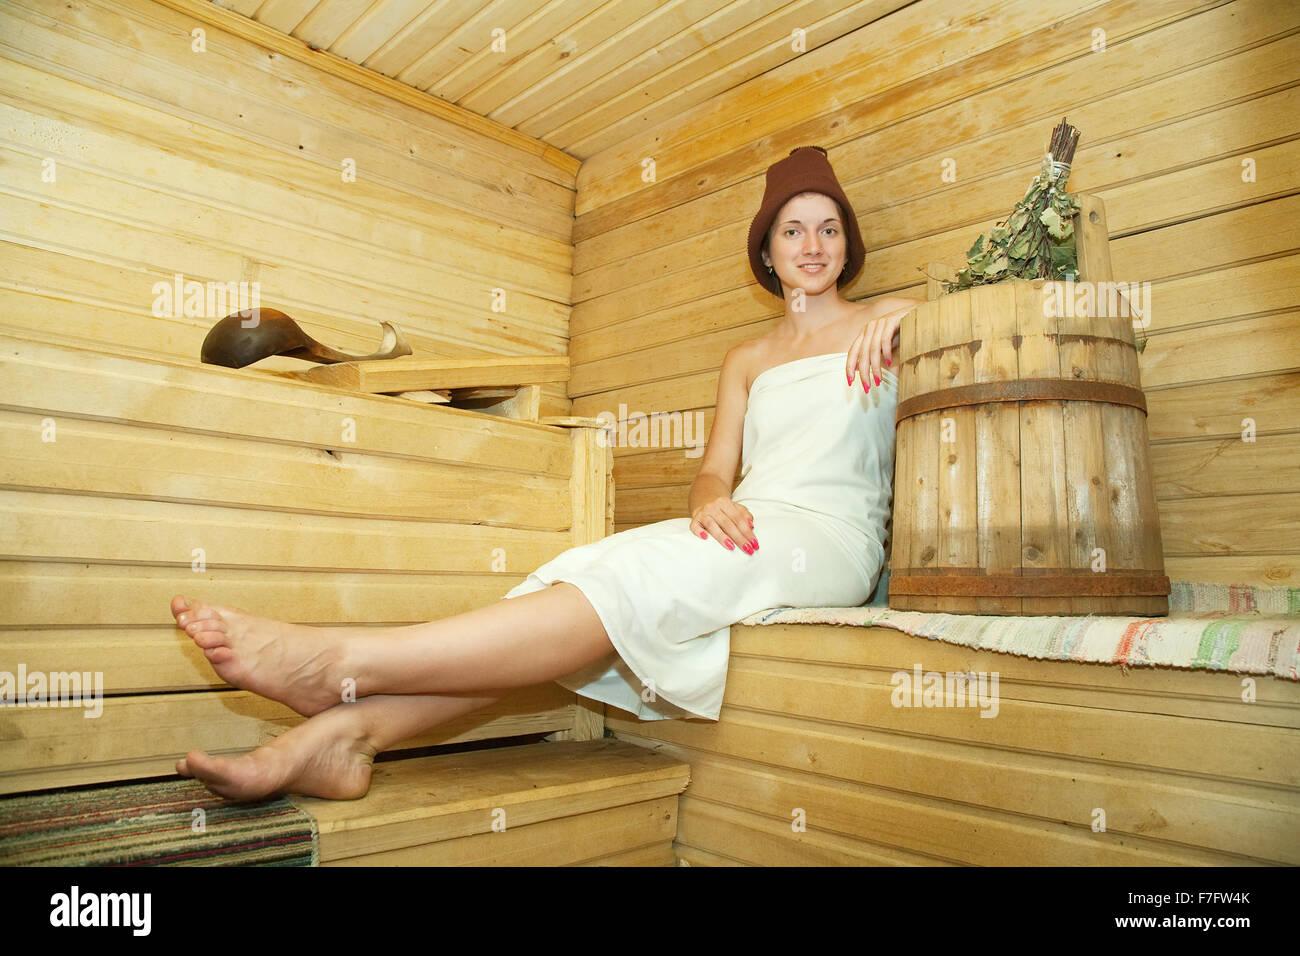 Русская баня фото с девушками